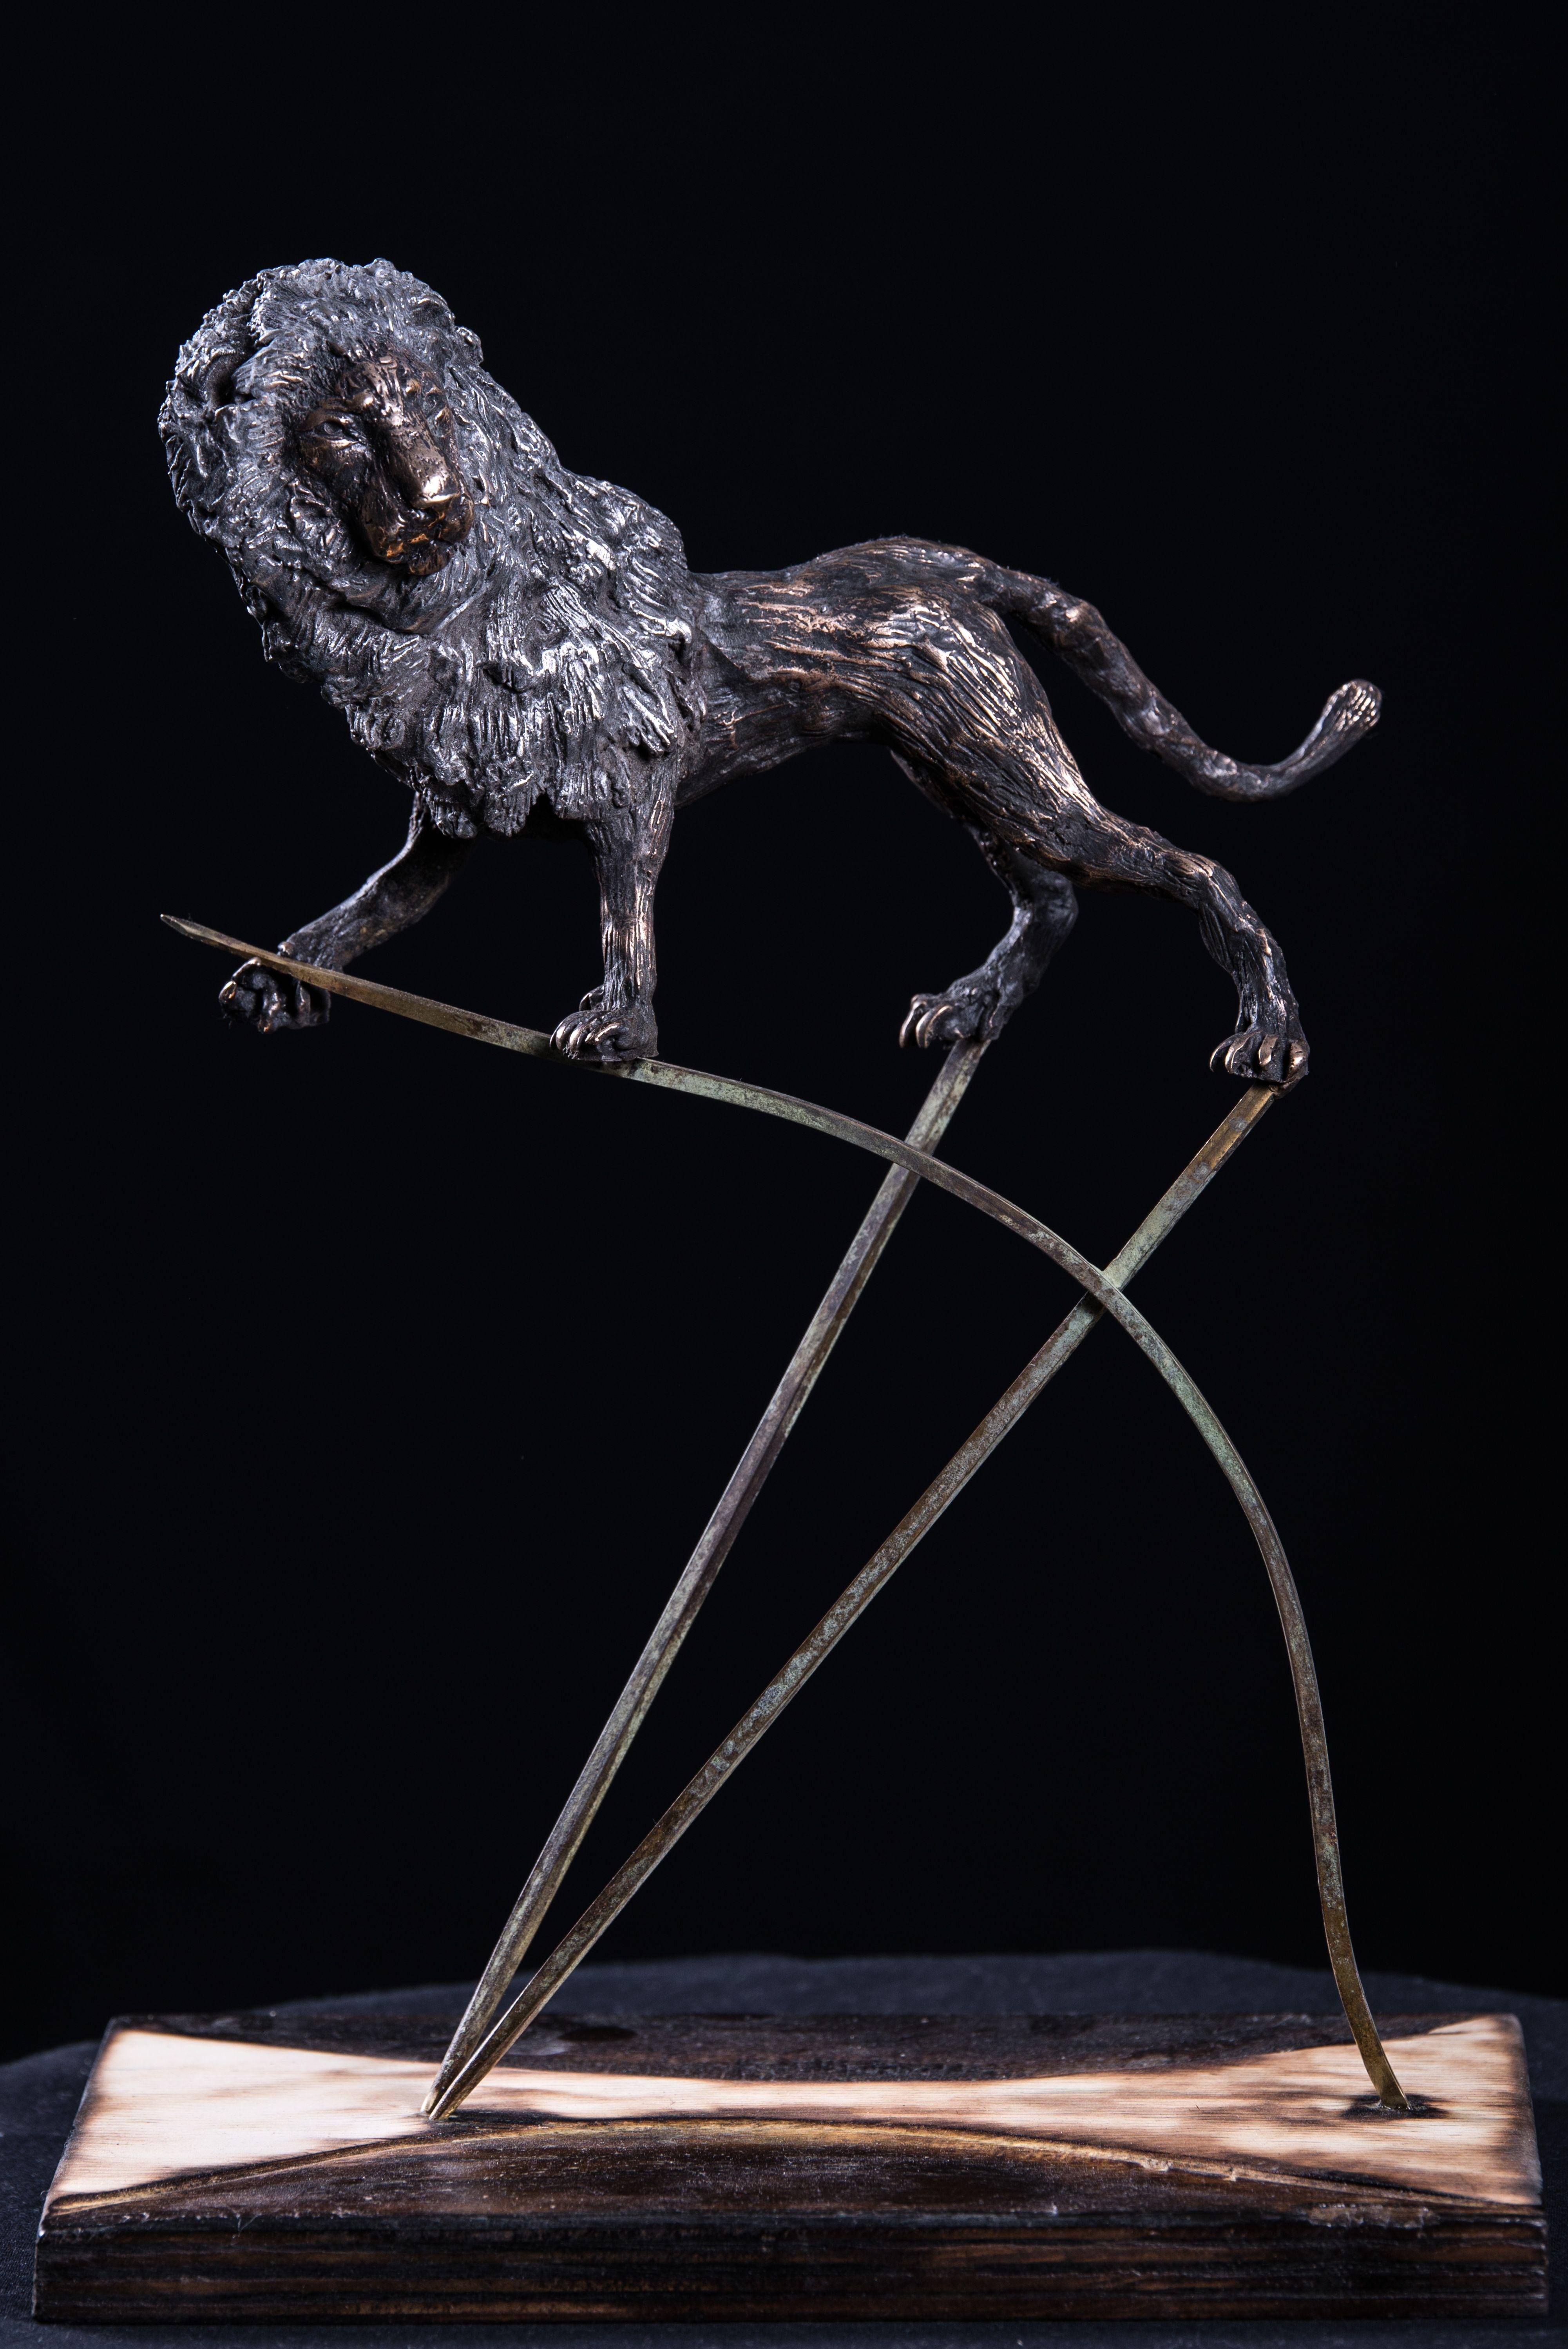 The Nemean Lion With Images